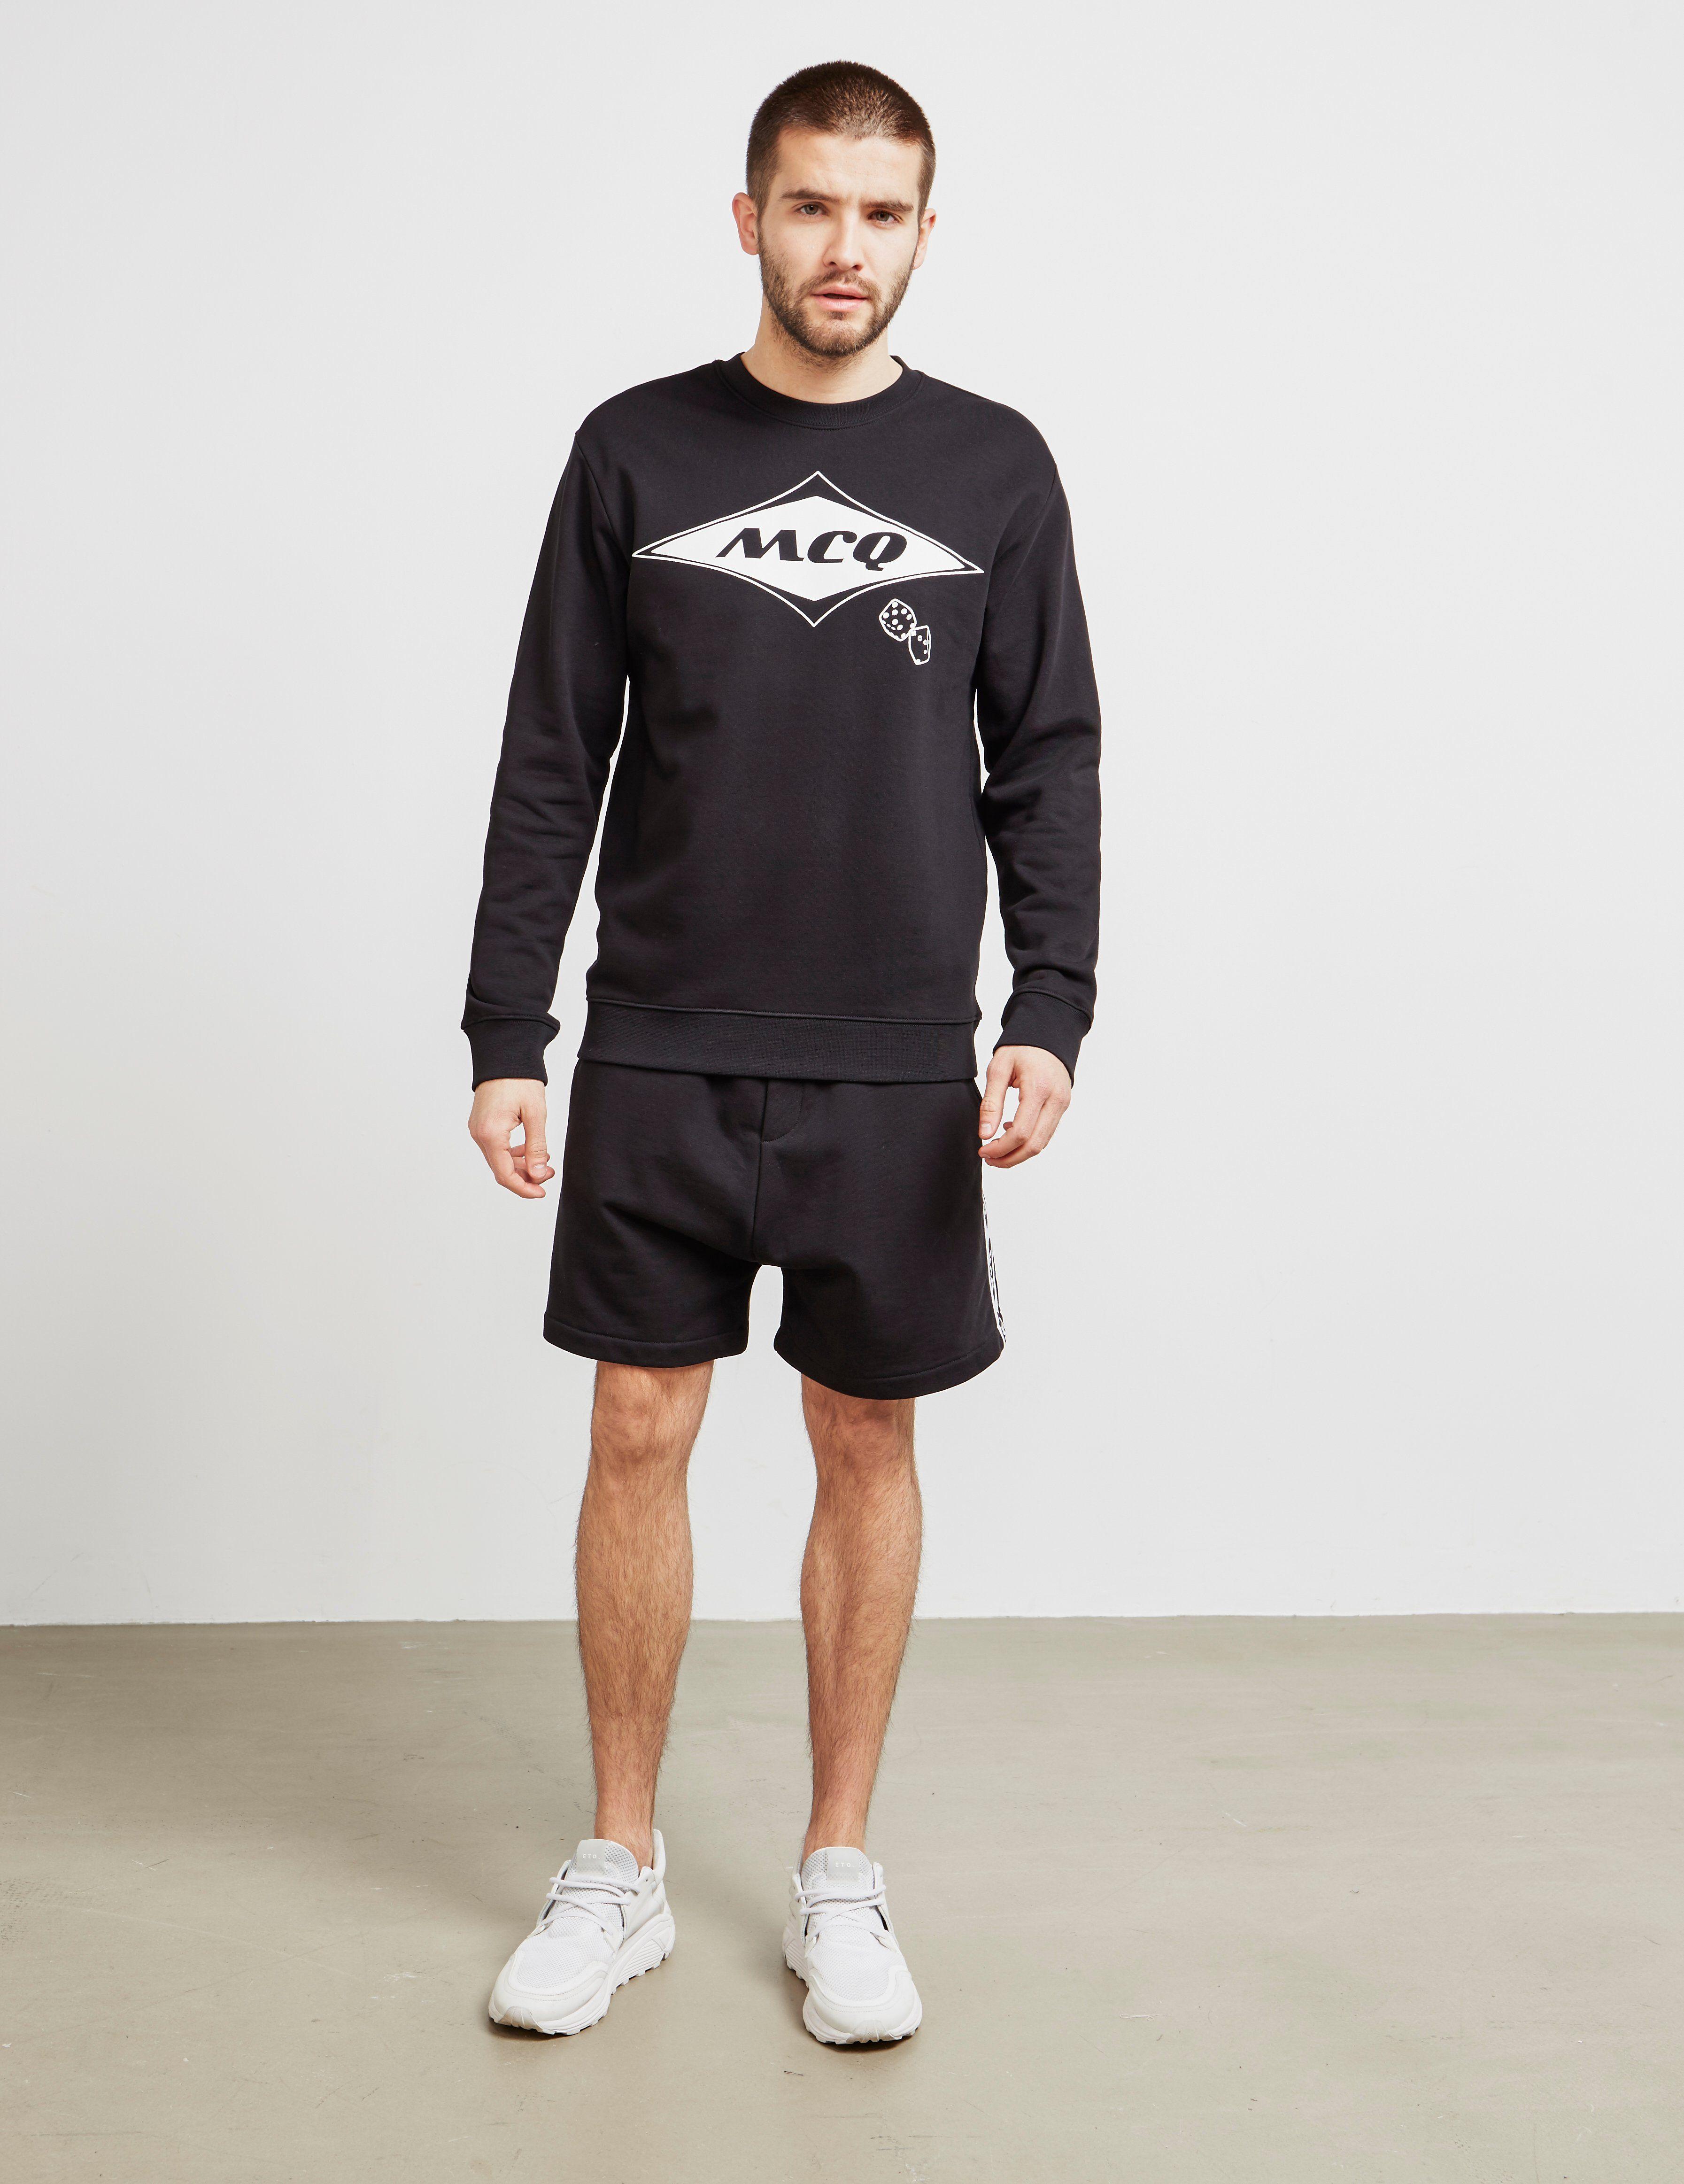 McQ Surf Sweatshirt